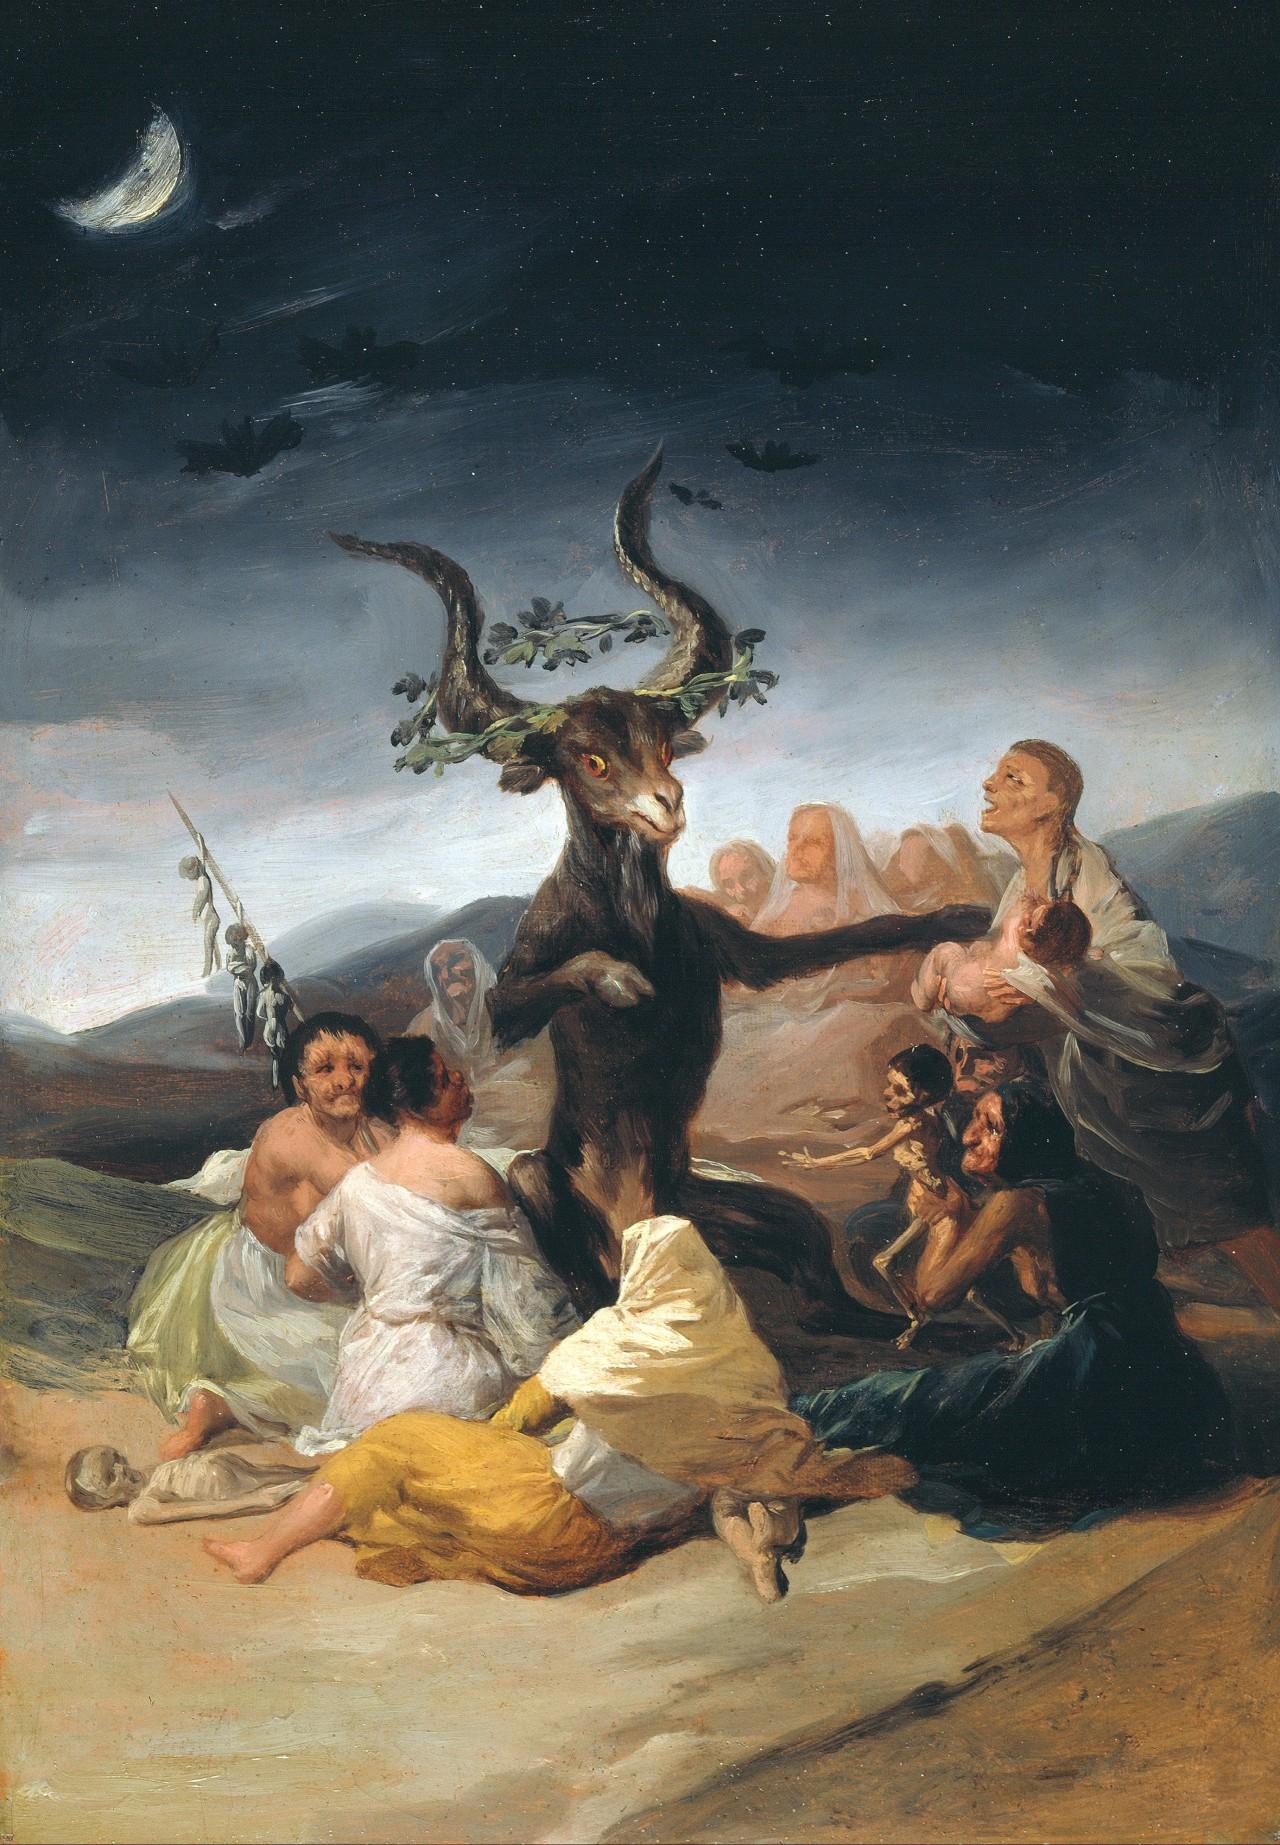 Francisco Goya; Witches' Sabbath, 1798